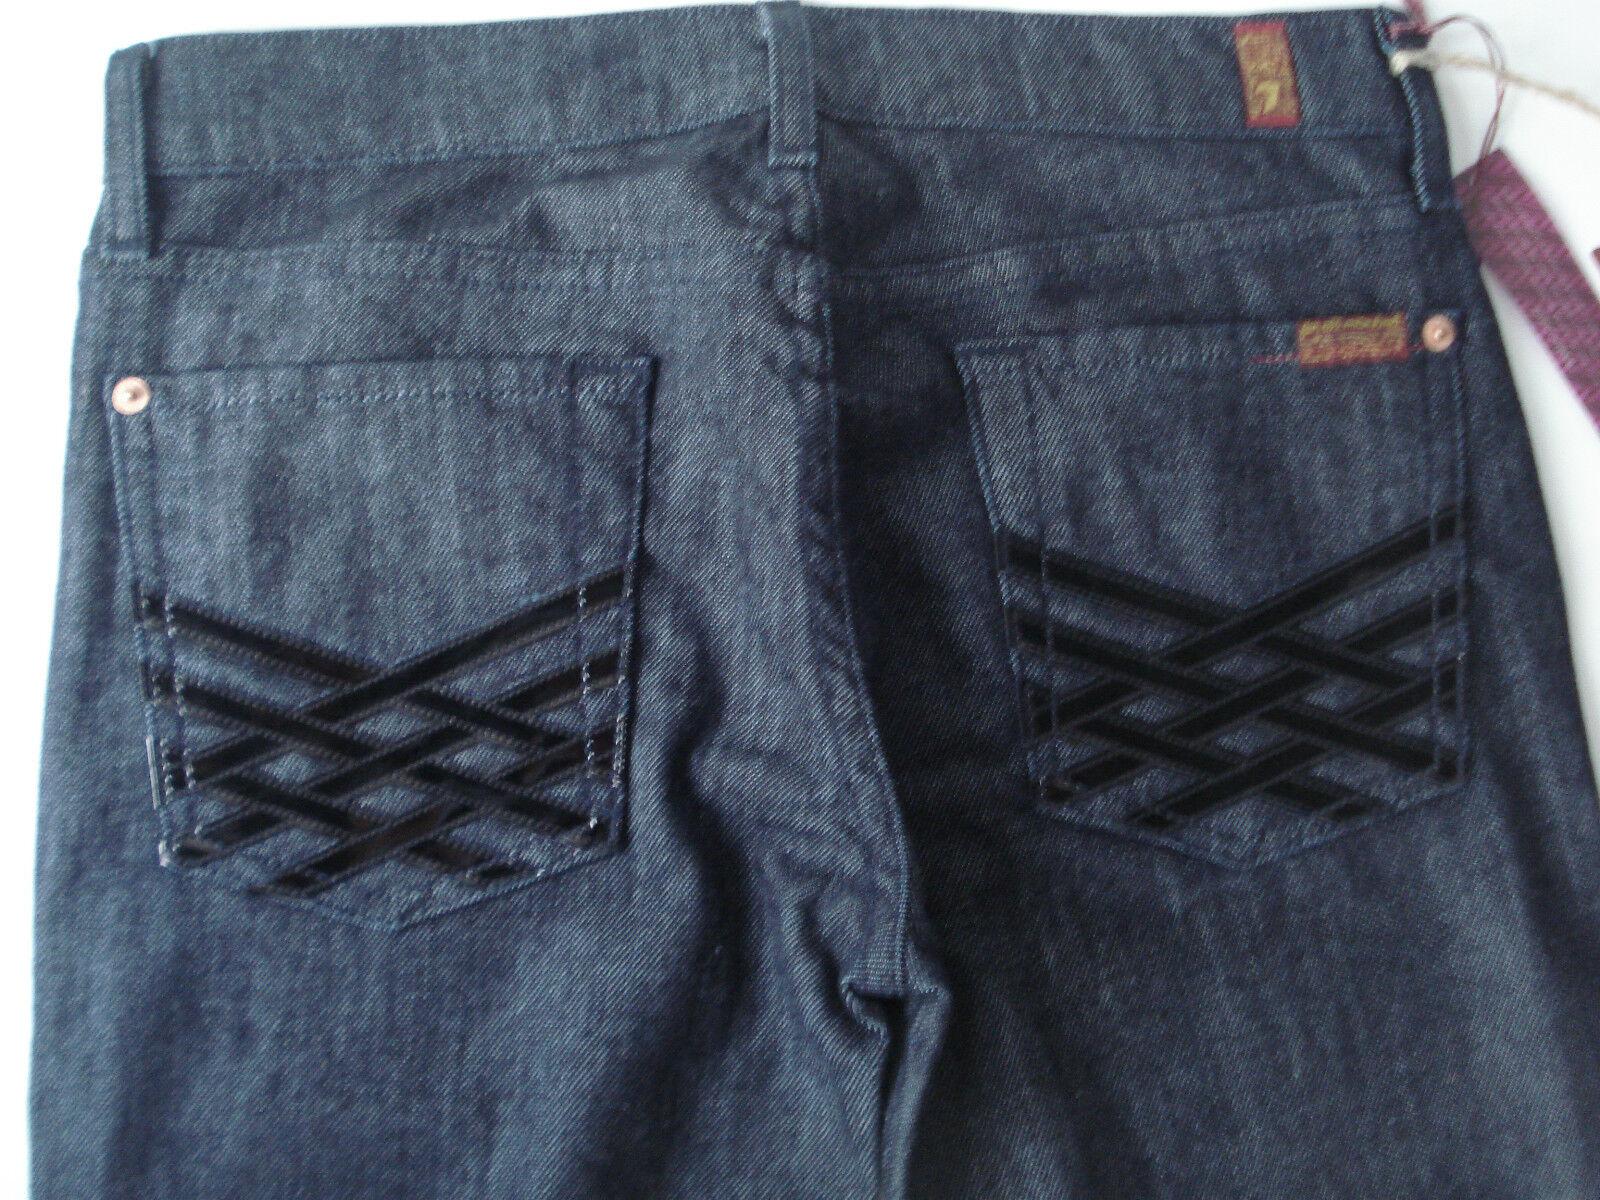 Seven for all Mankind SFAM Dojo Denim Hose Jeans Blau Gr 27 32